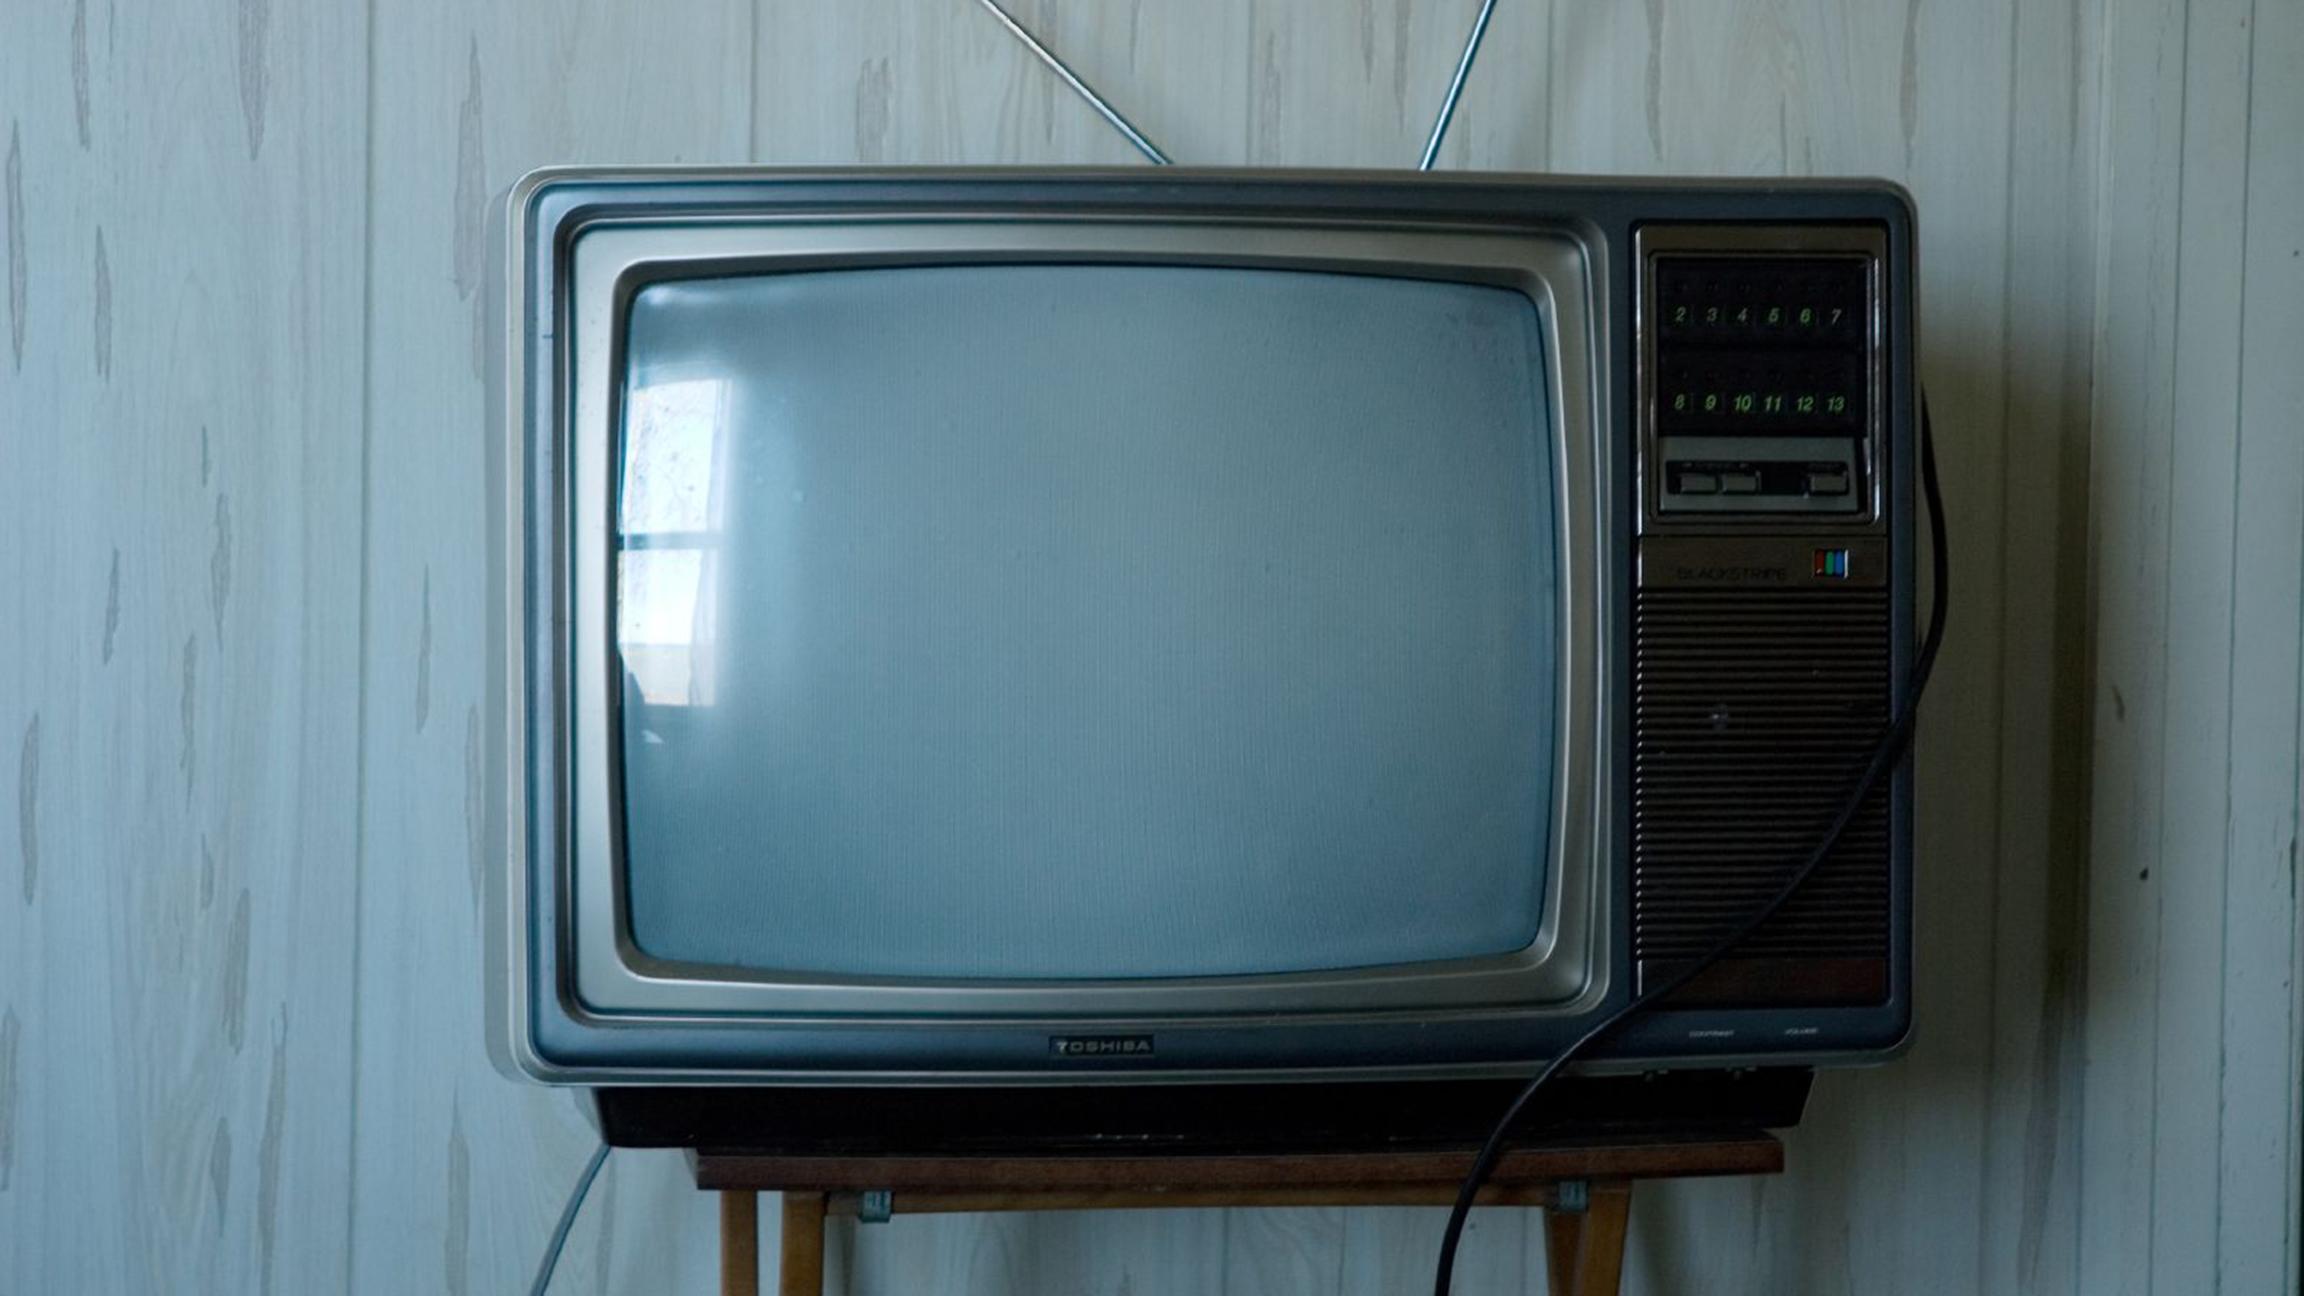 Tele Vision Movie HD free download 720p